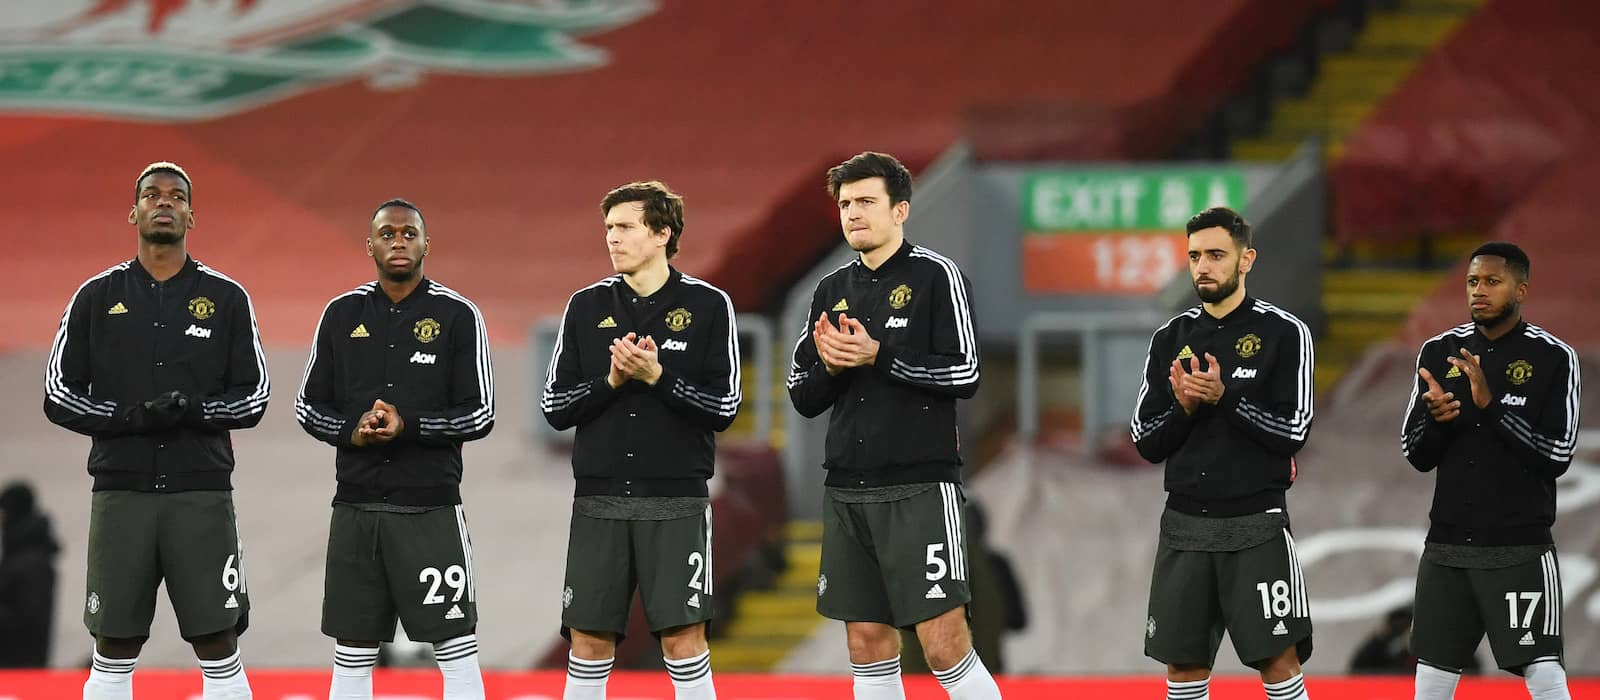 Ole Gunnar Solskjaer has reinvigorated Manchester United's defence